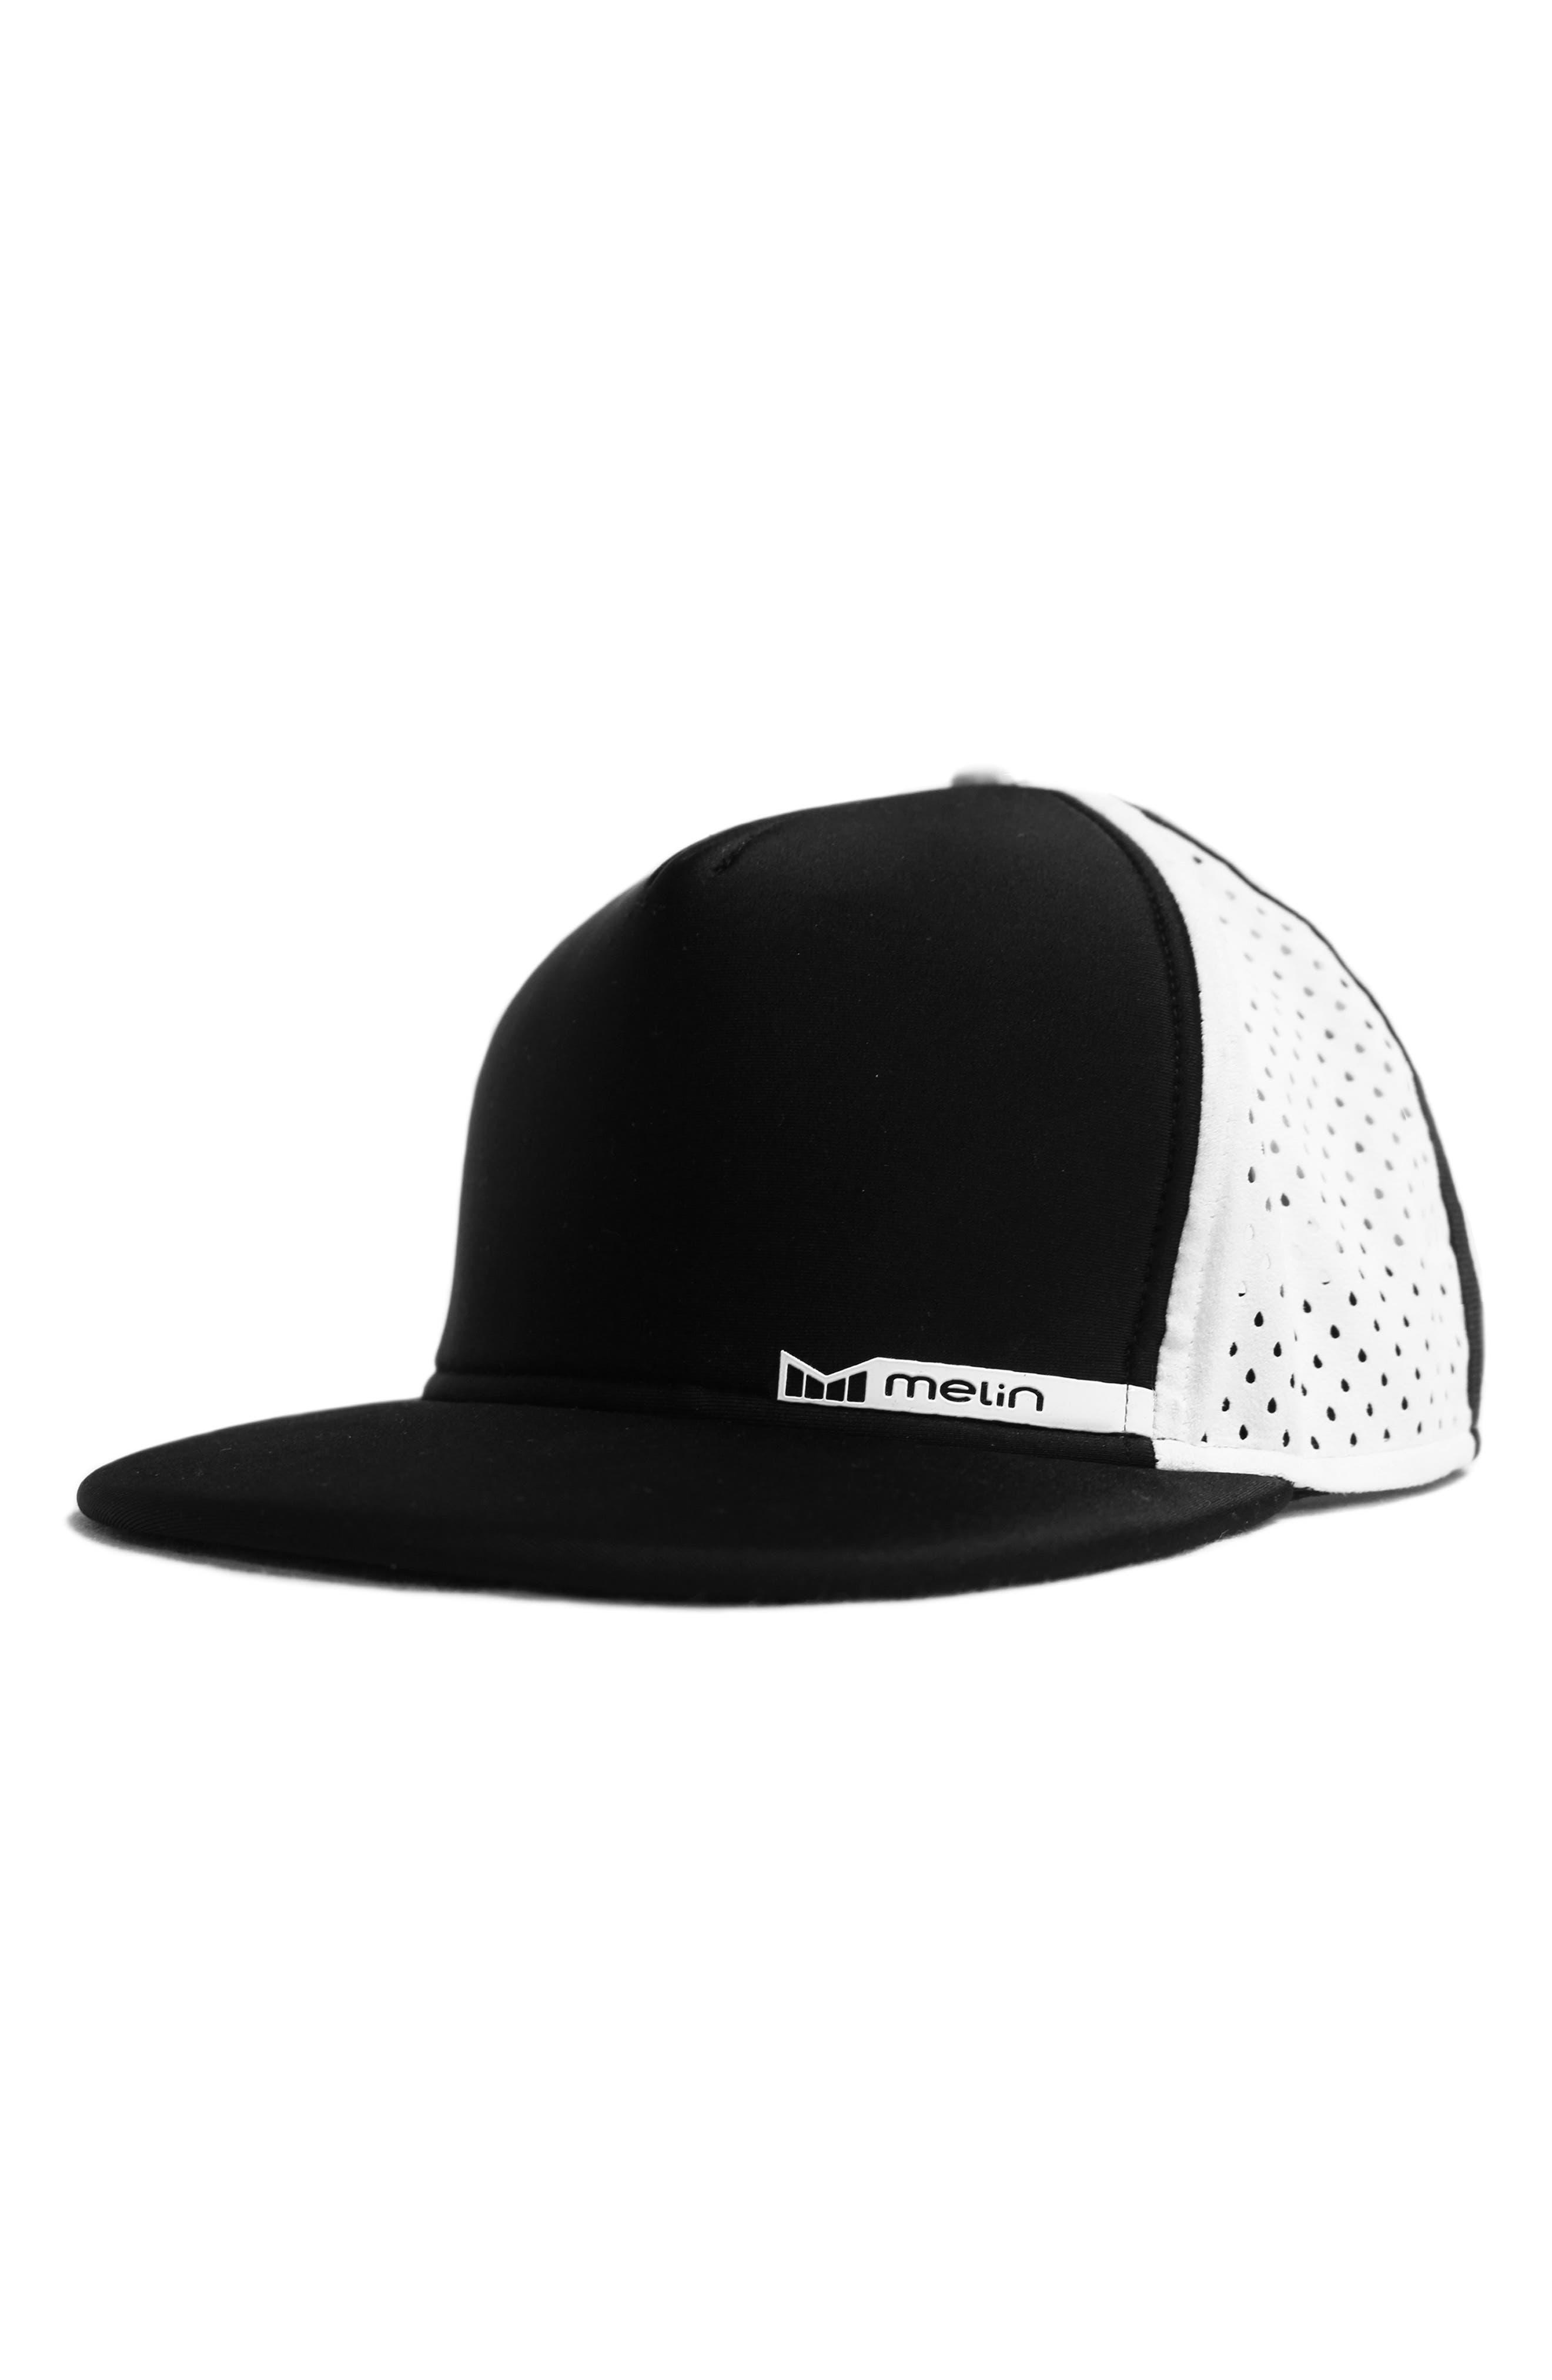 Alternate Image 1 Selected - Melin 'Amphibian' Split Fit Snapback Baseball Cap